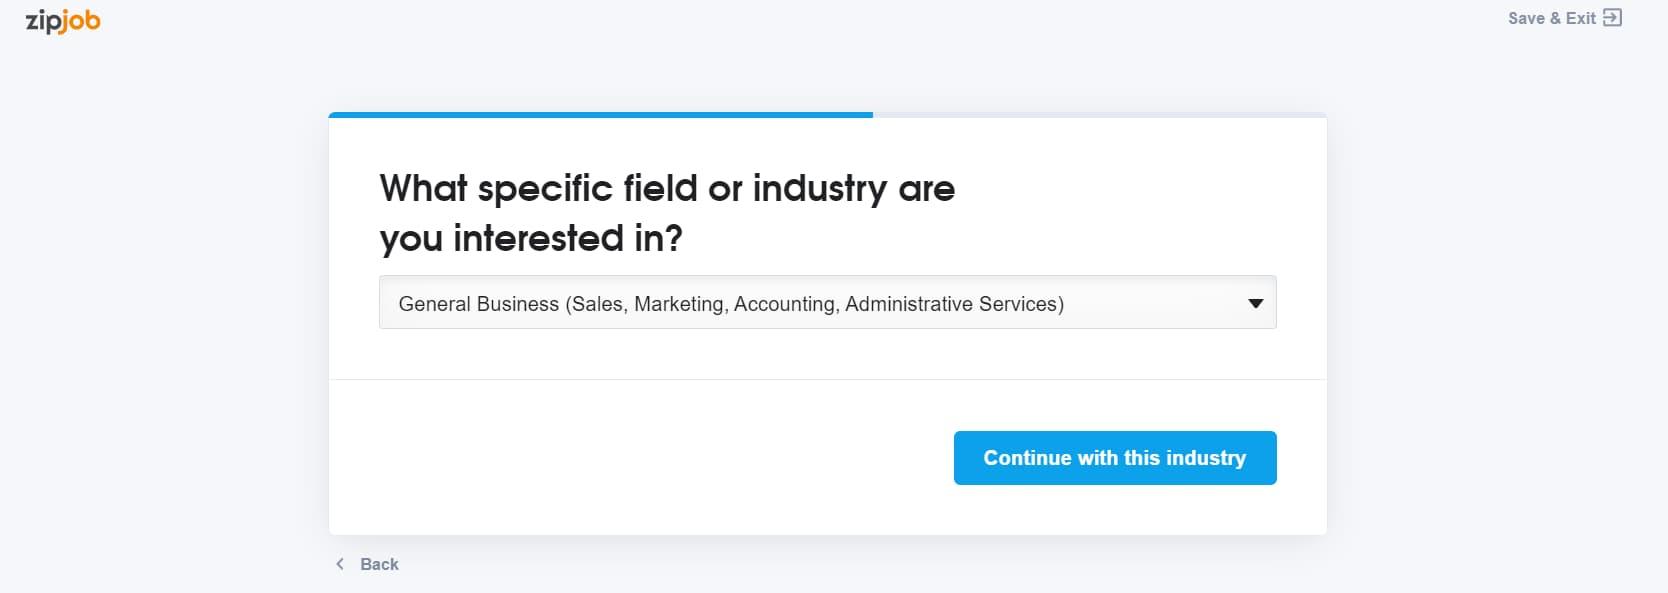 zipjob specific industry